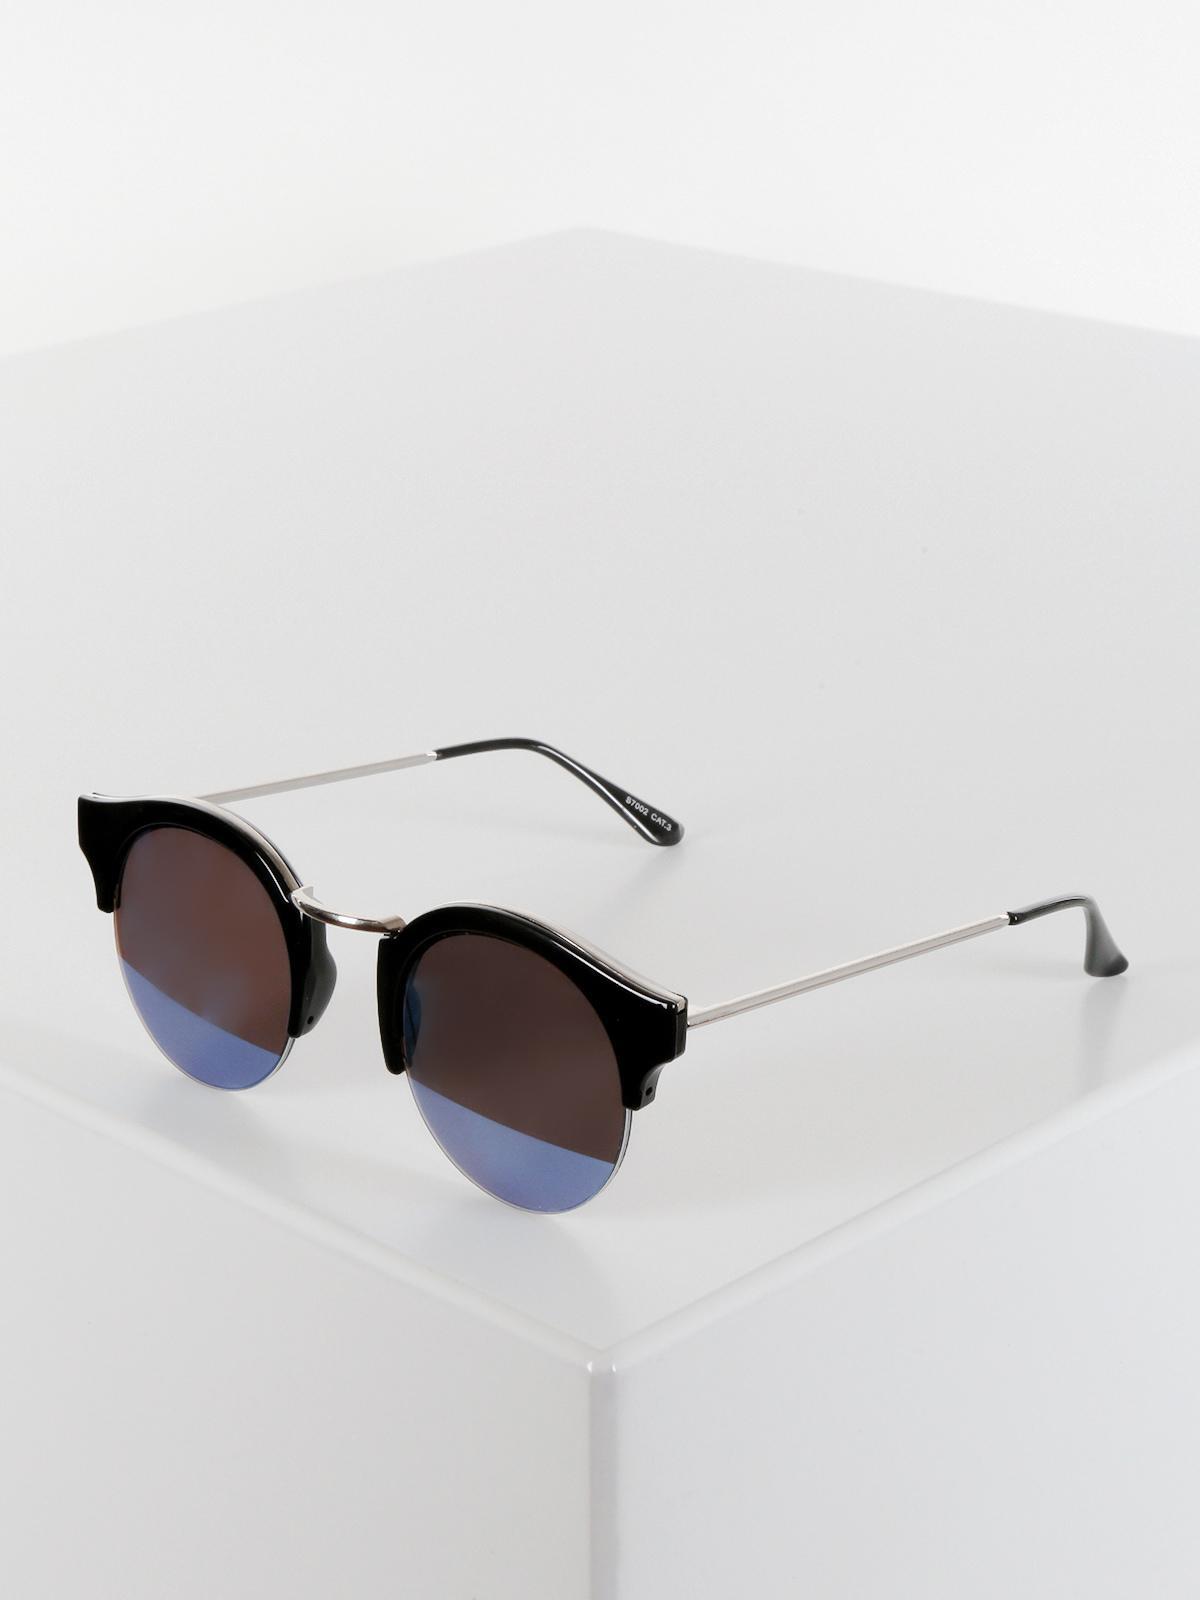 93a54249fc Occhiali da sole tondi seevision | MecShopping